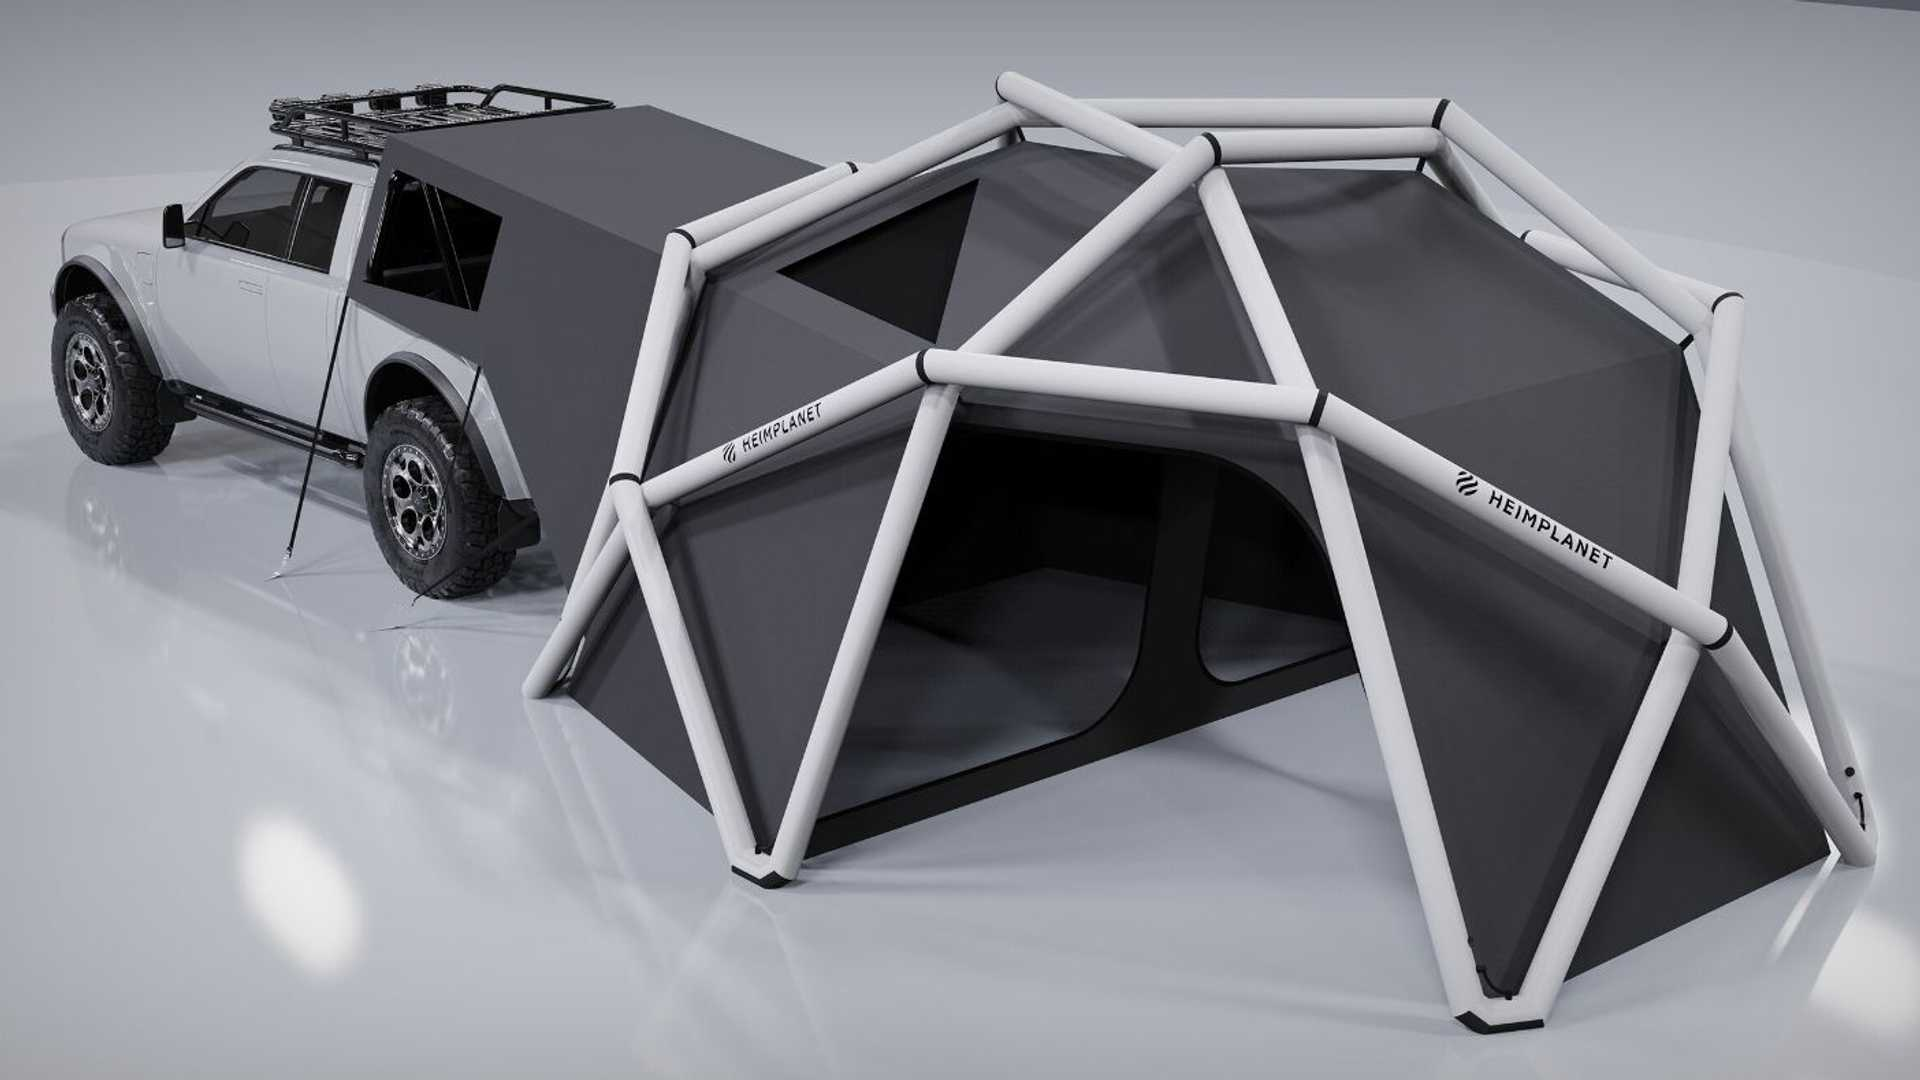 Alpha Motors Wolf + Cloudbreak Tent View